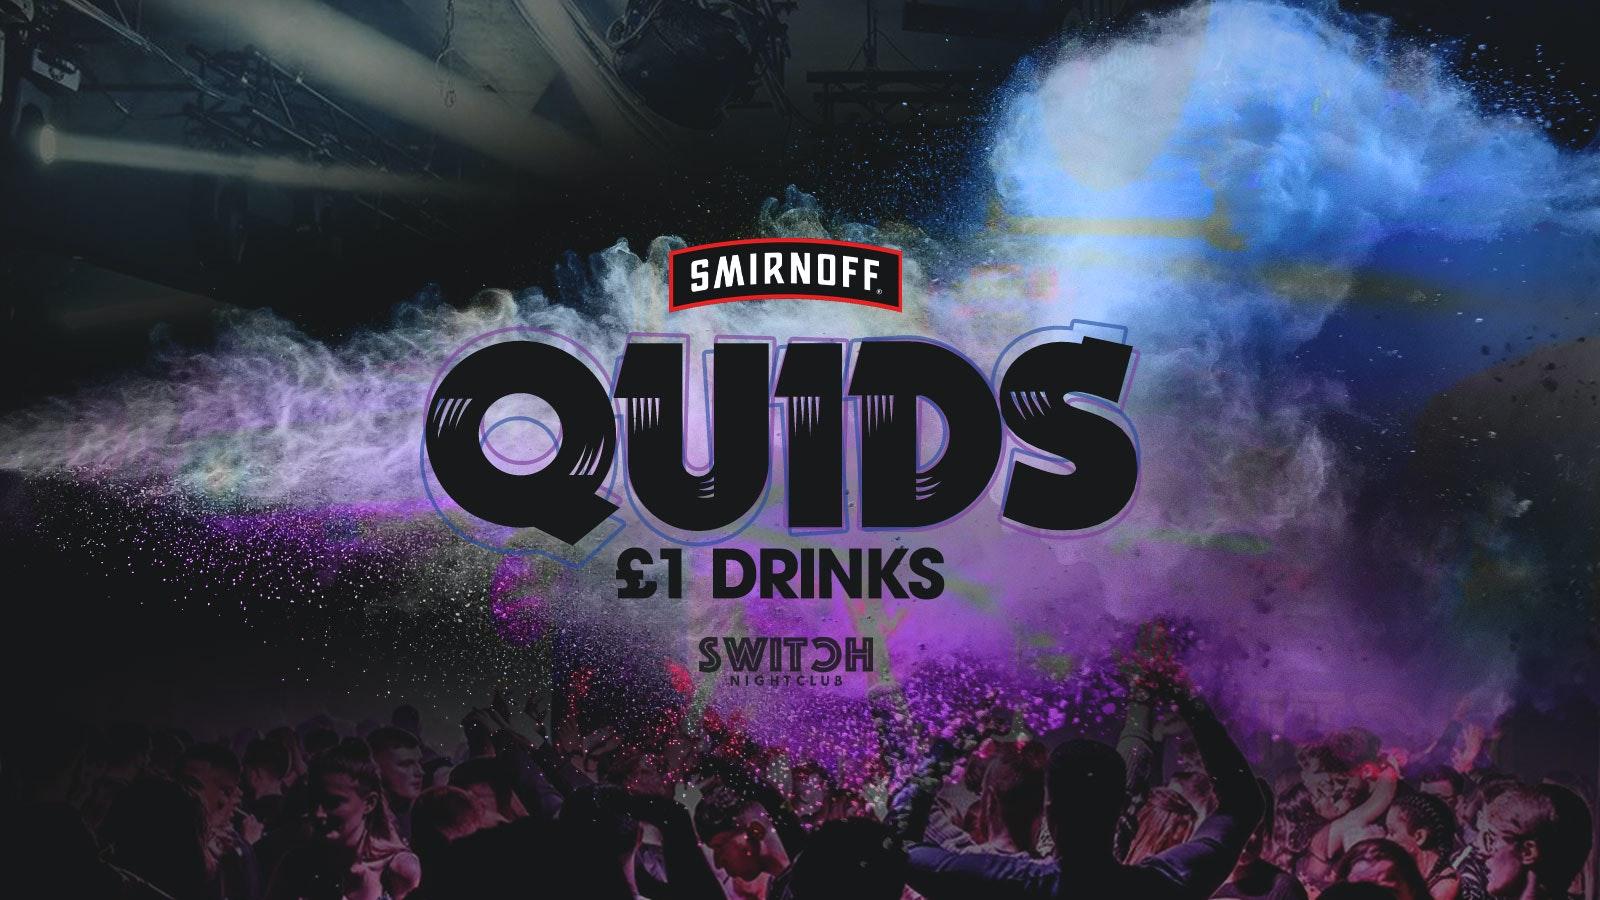 QUIDS FRIDAYS   Switch   £1 Drinks